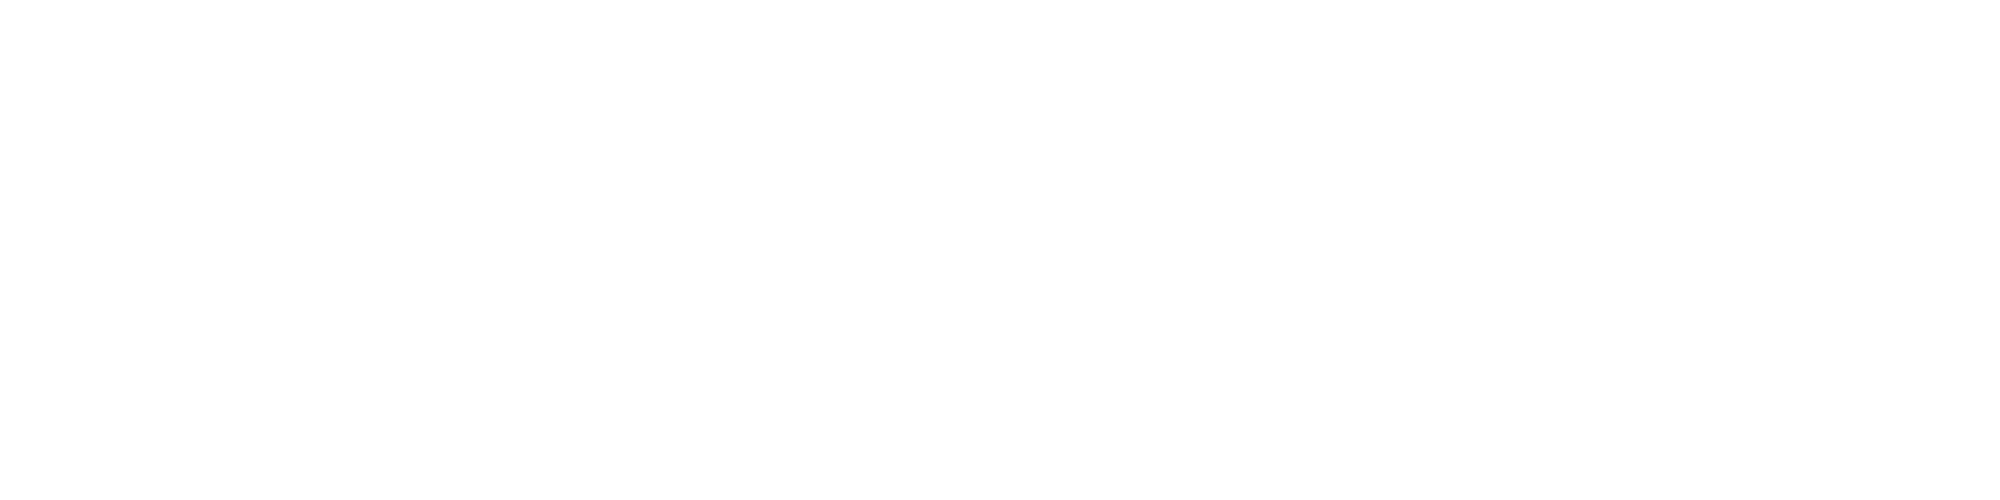 E Kurz Co Ihre Druckerei In Stuttgart